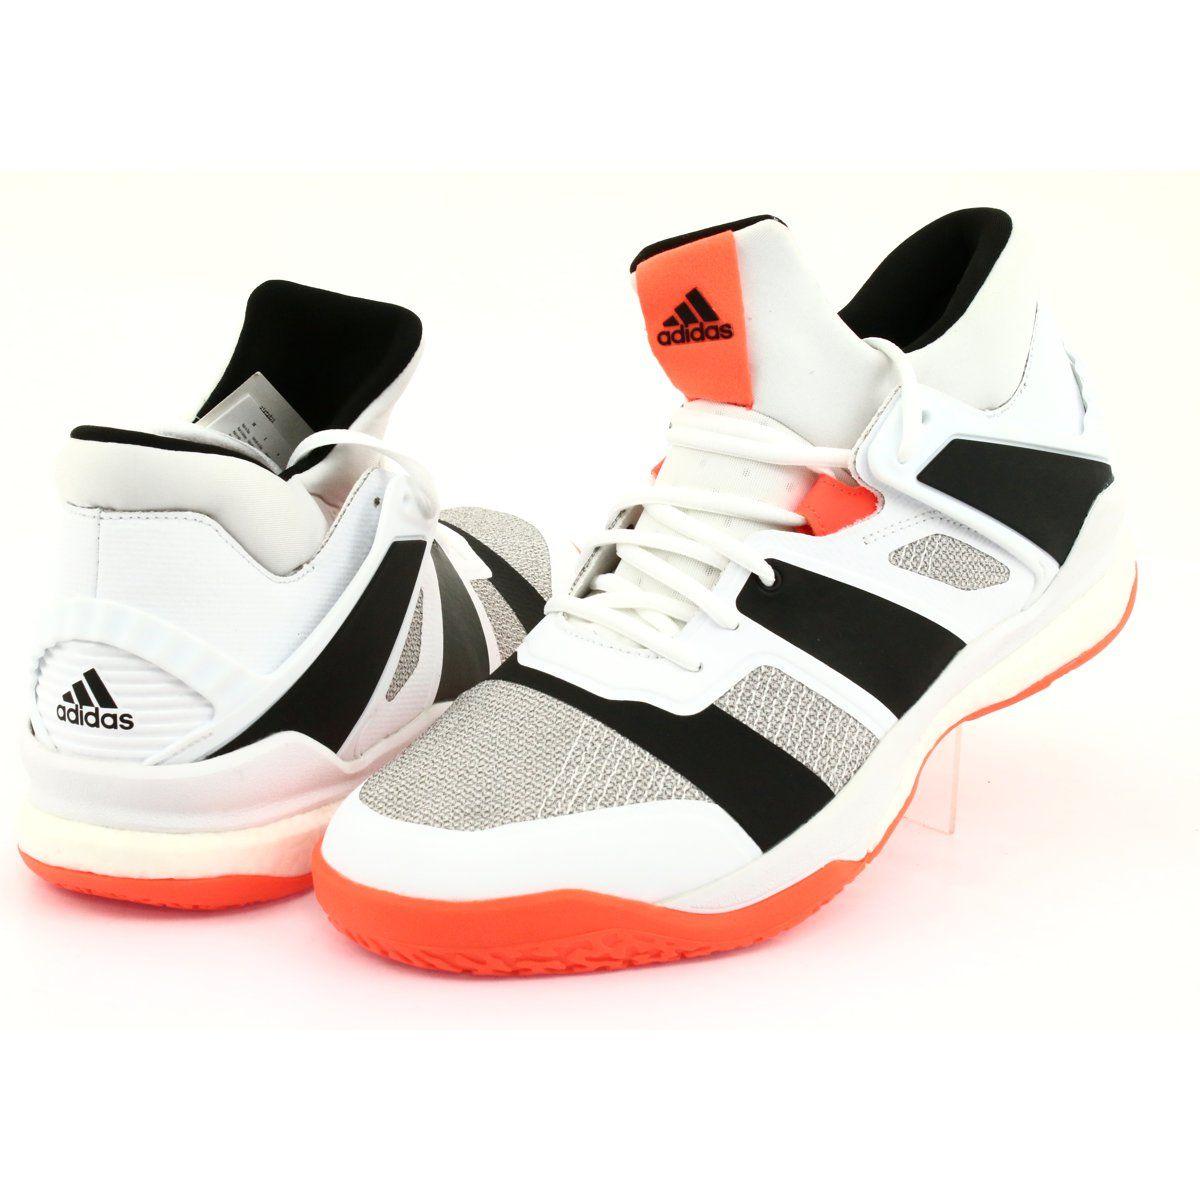 Buty adidas Stabil X Mid M F33827 białe | Buty, Buty adidas